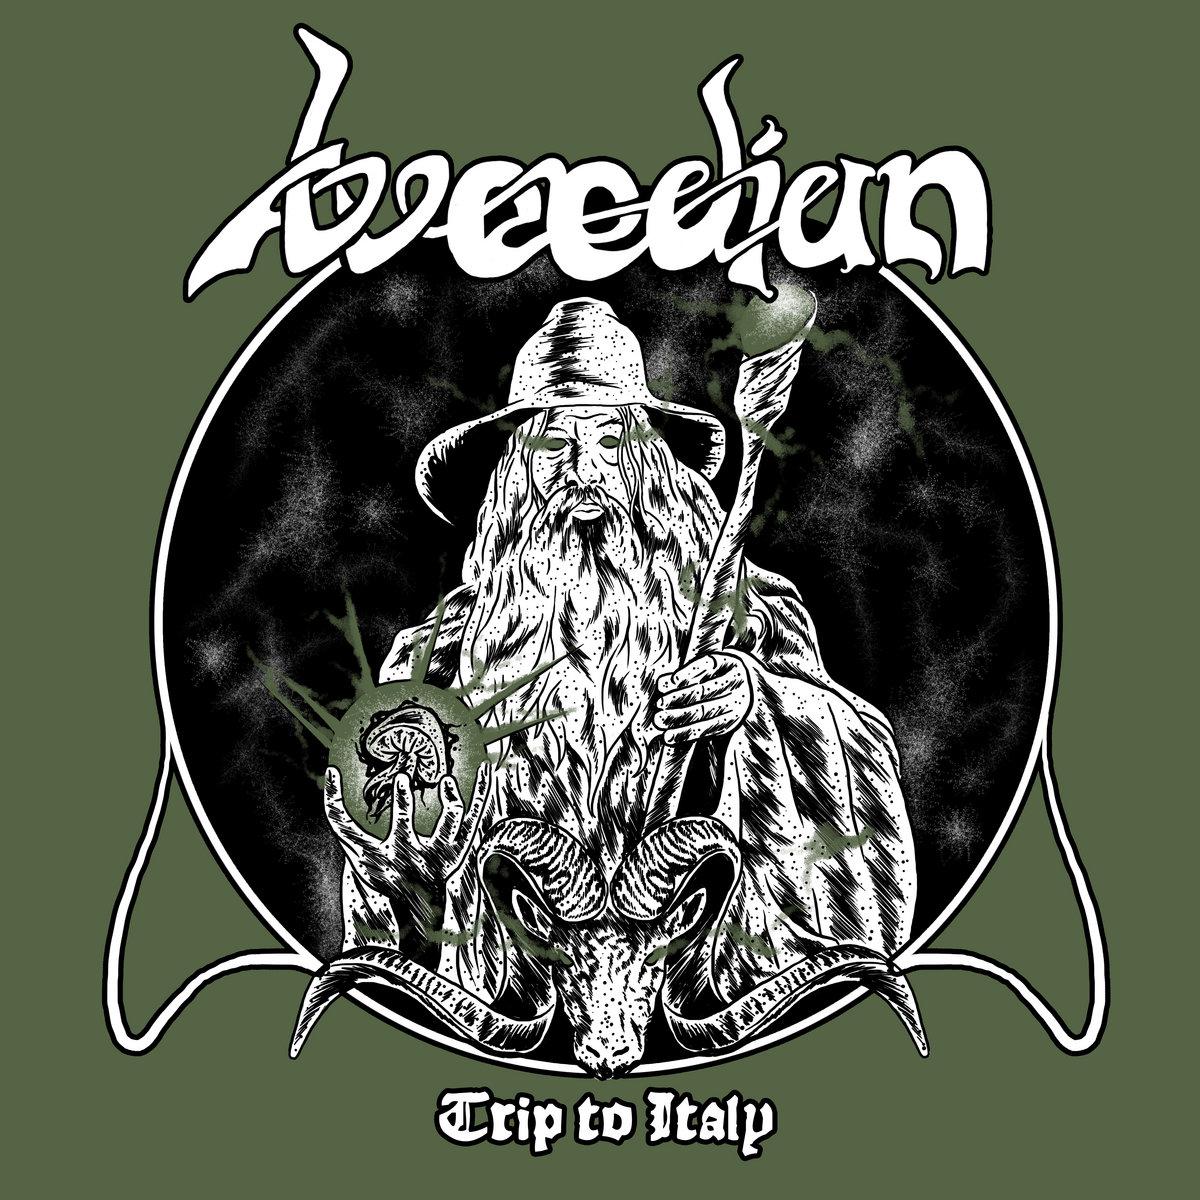 Weedian - Trip To Italy - compilation - doom-stoner - 1782 - Black Capricorn - Elepharmers - ascolti - 2021 - Sa Scena - 23 aprile 2021